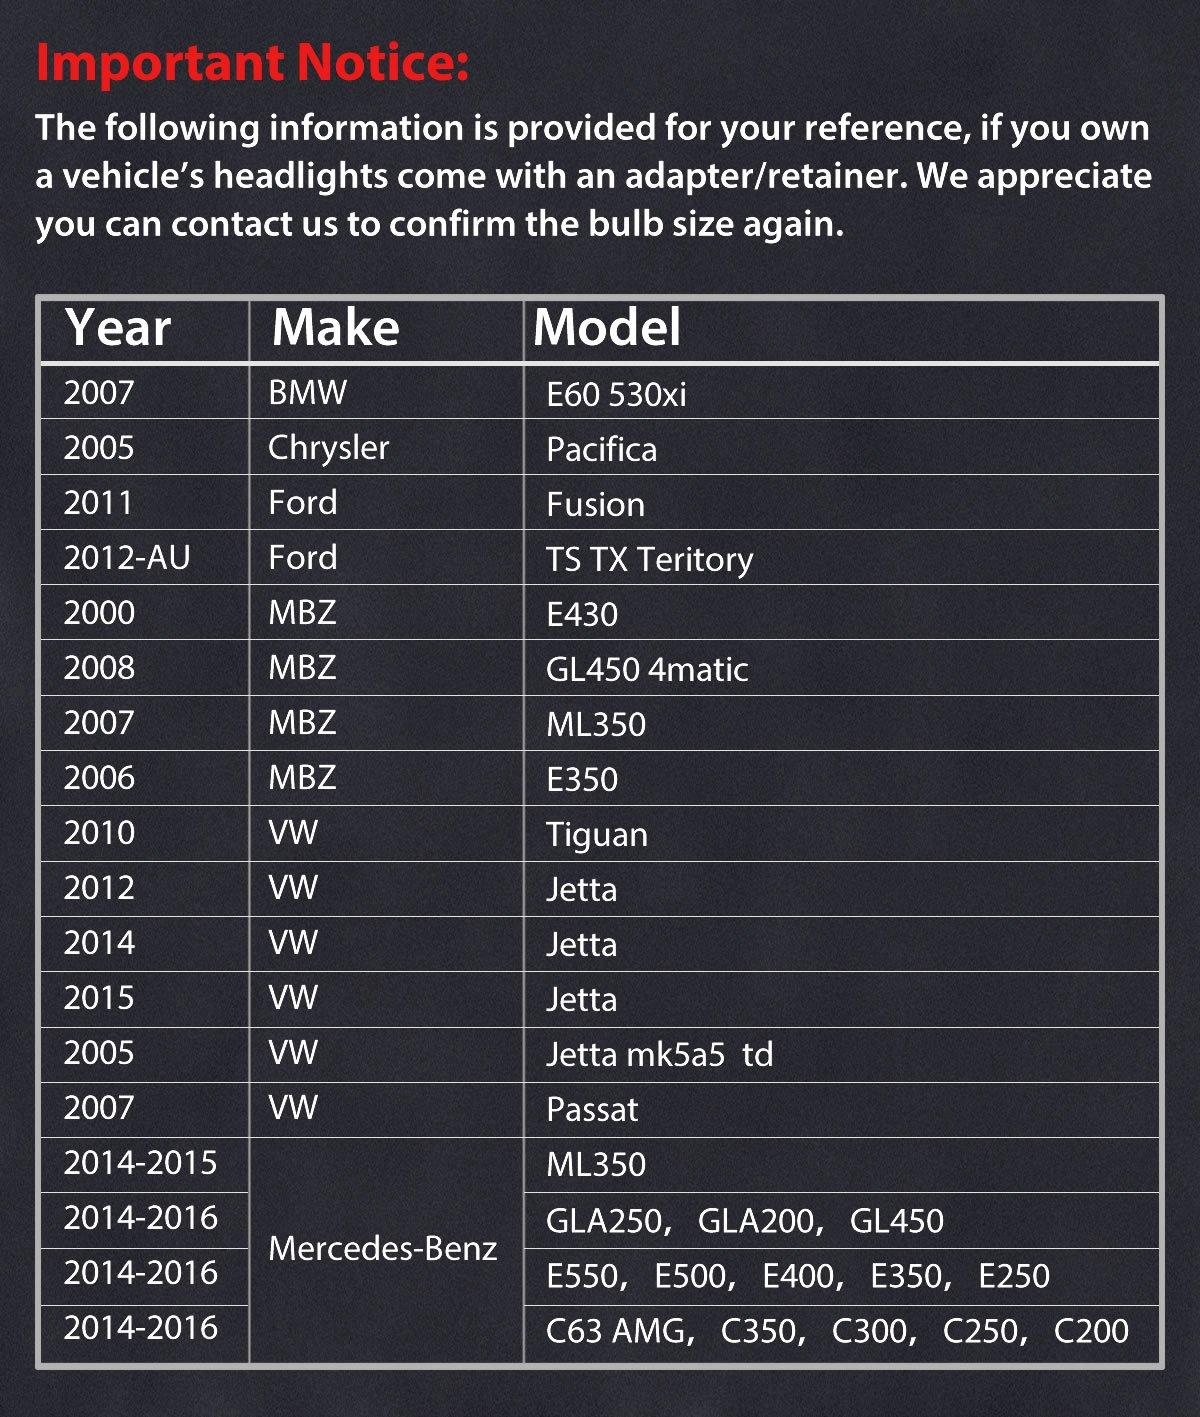 H7 LED Headlight Bulbs 72W 7600LM LED Headlight Conversion Kits 6000K Cool  White Upgraded Flip Chips-Hi/Lo Beam